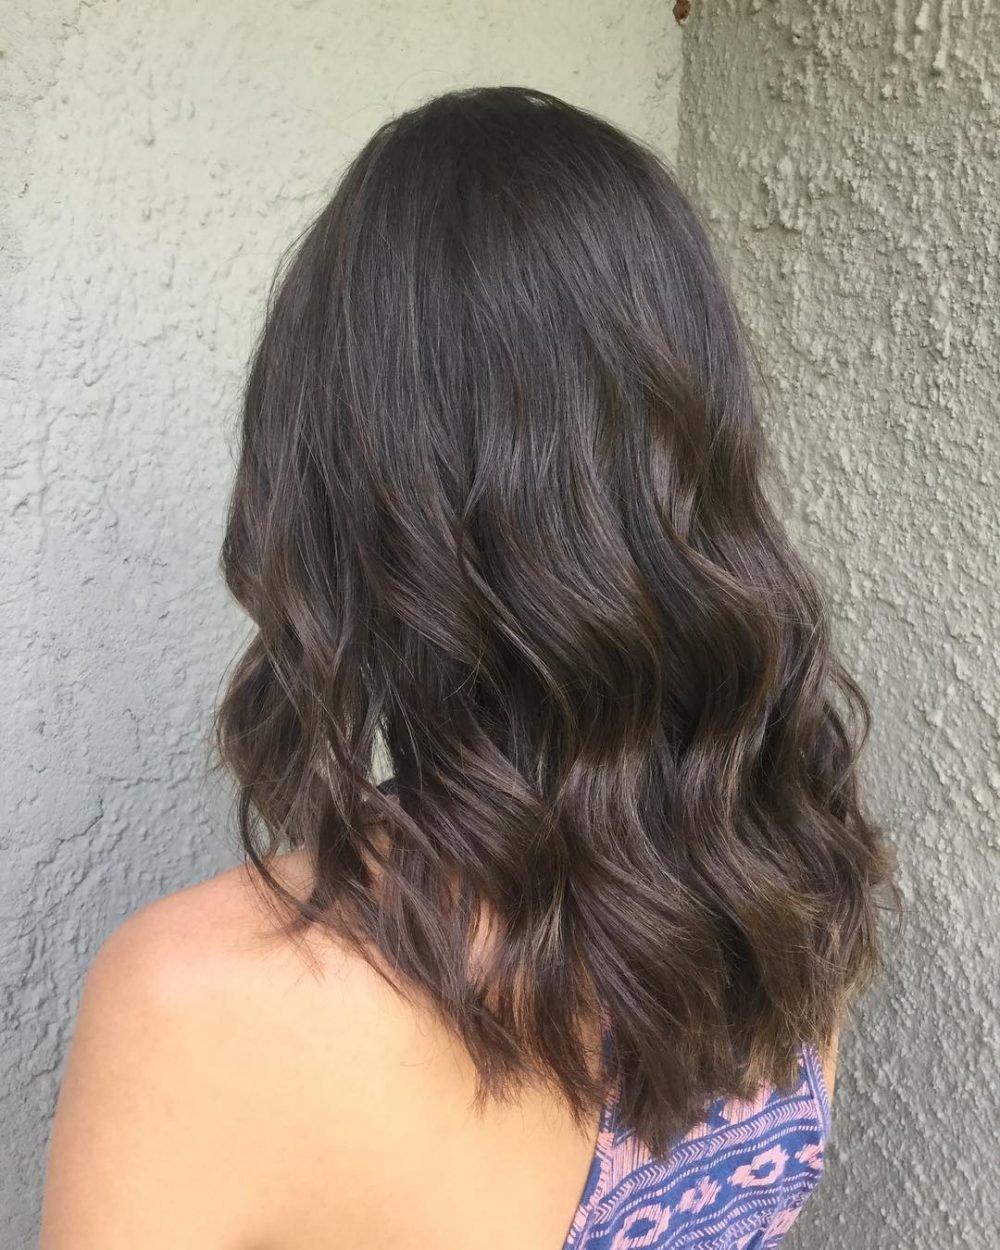 Versatile Lob hairstyle